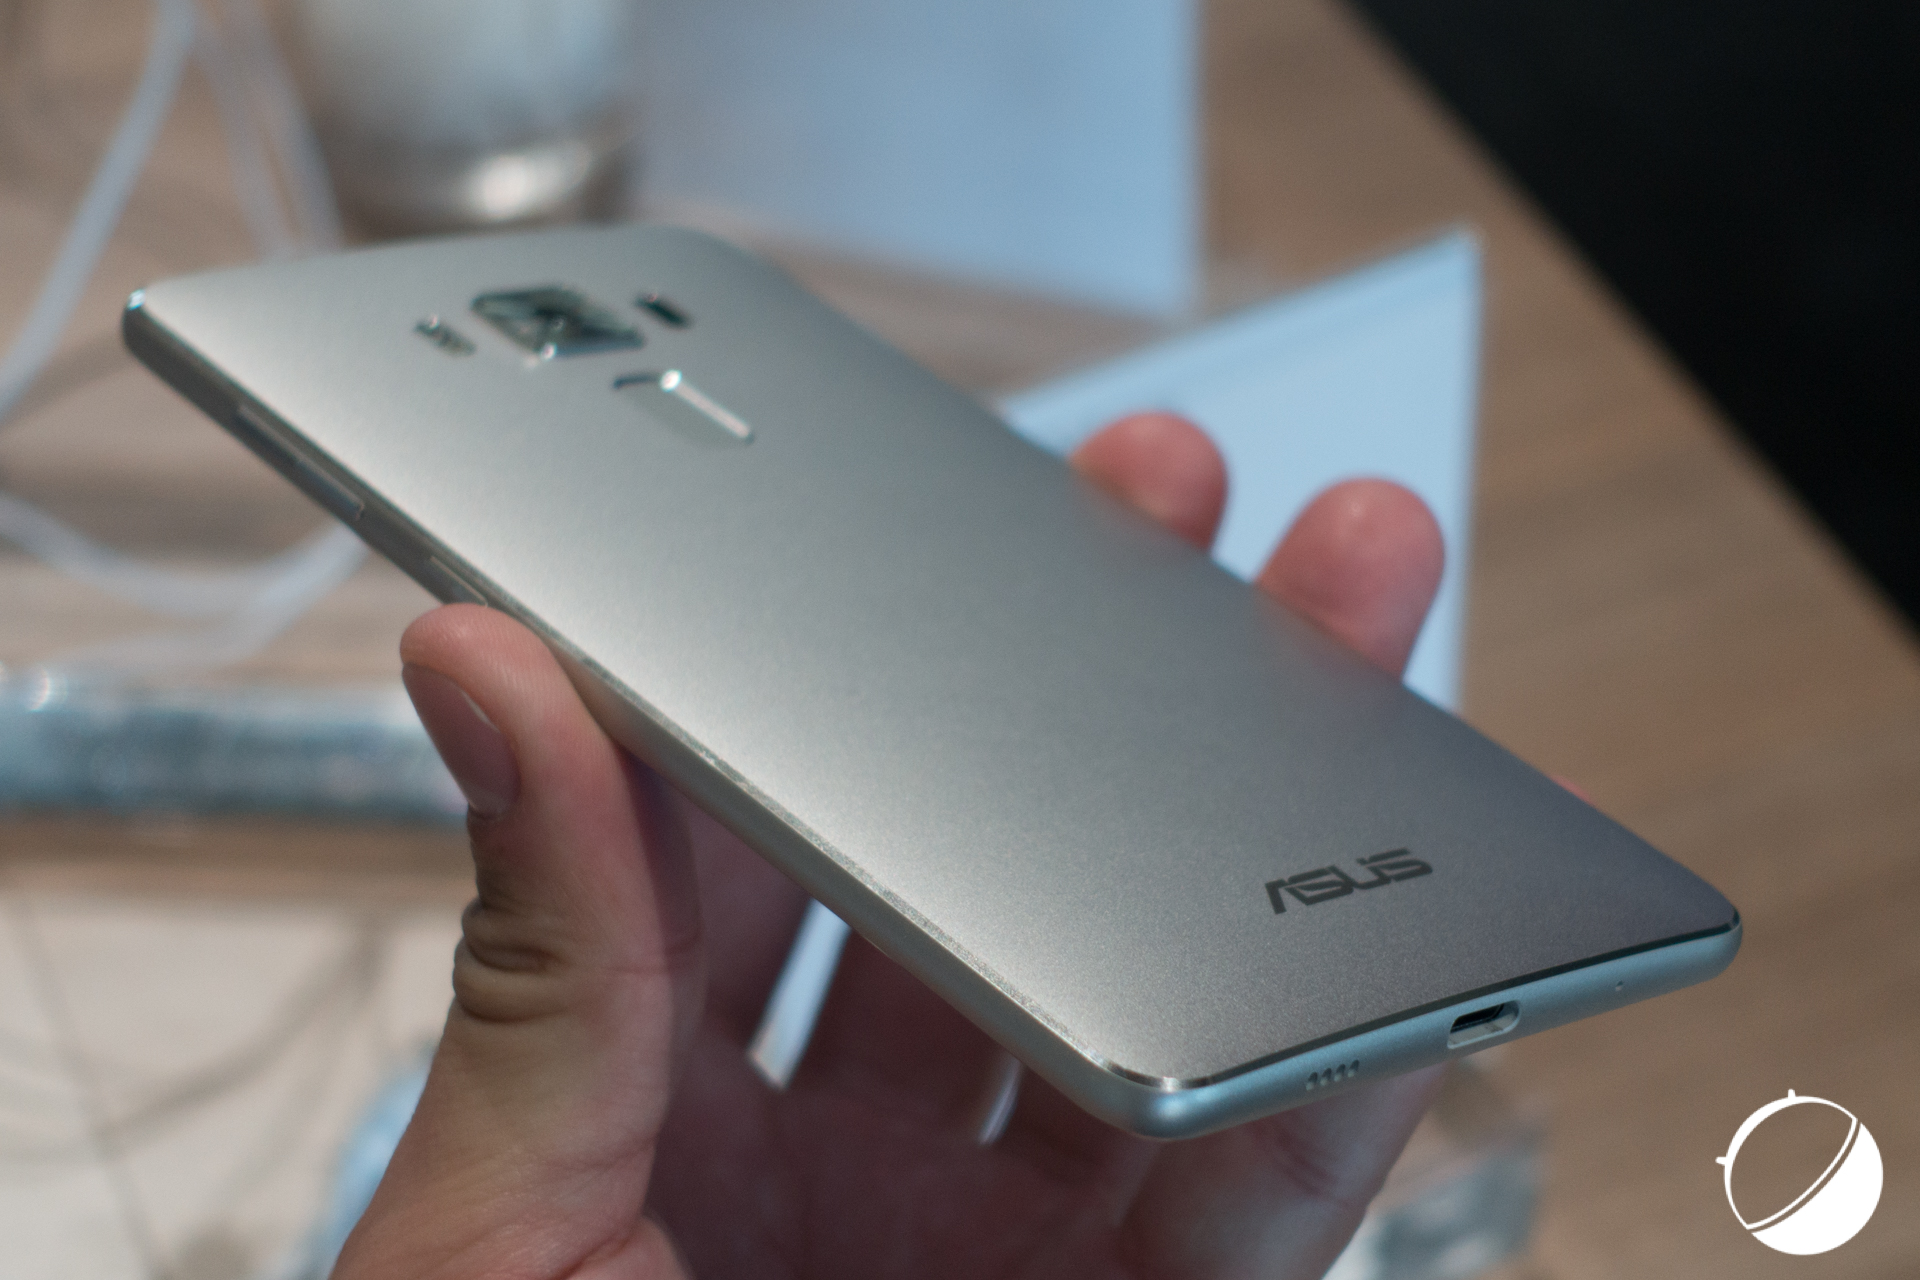 Asus Zenfone 3 Comparatif Des Six Versions Max Laser Ultra 32gb 2 Sur 6